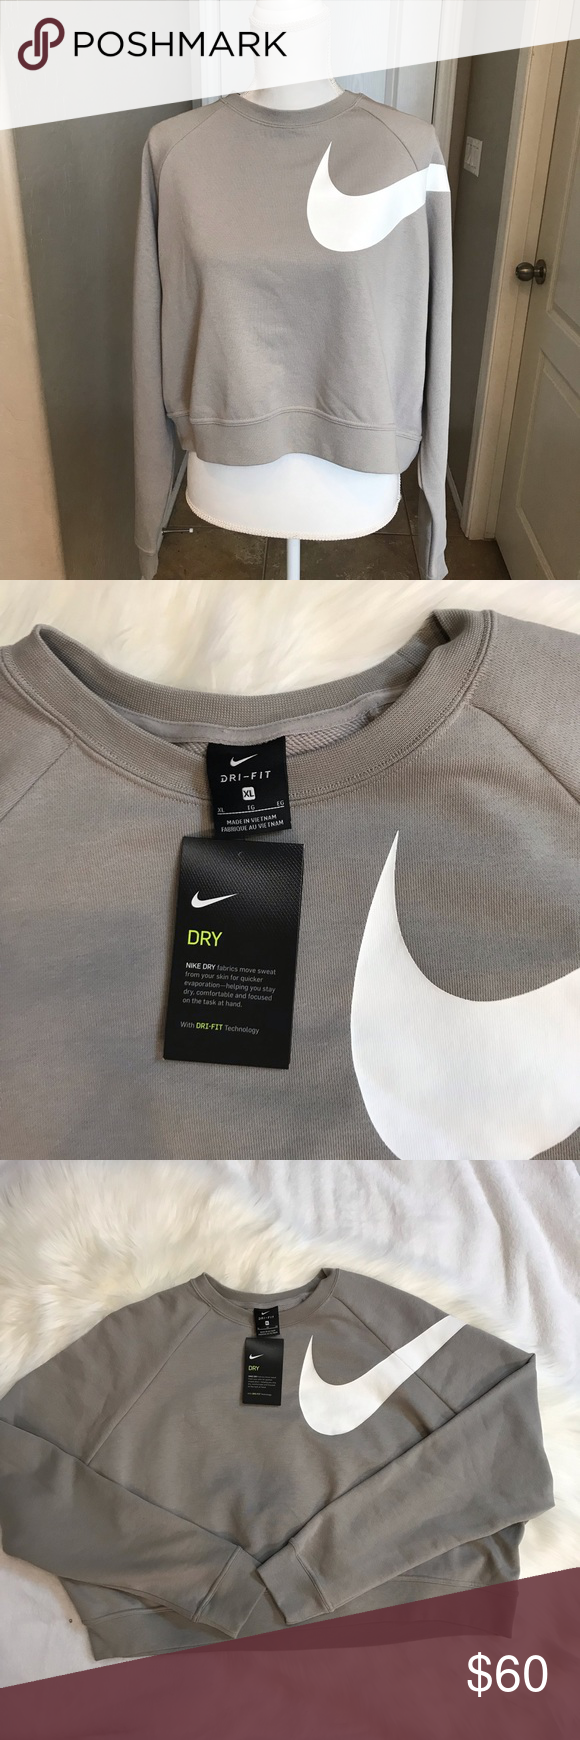 Nike Versa Crop Sweatshirt Nwt Crop Sweatshirt Clothes Design Sweatshirts [ 1740 x 580 Pixel ]